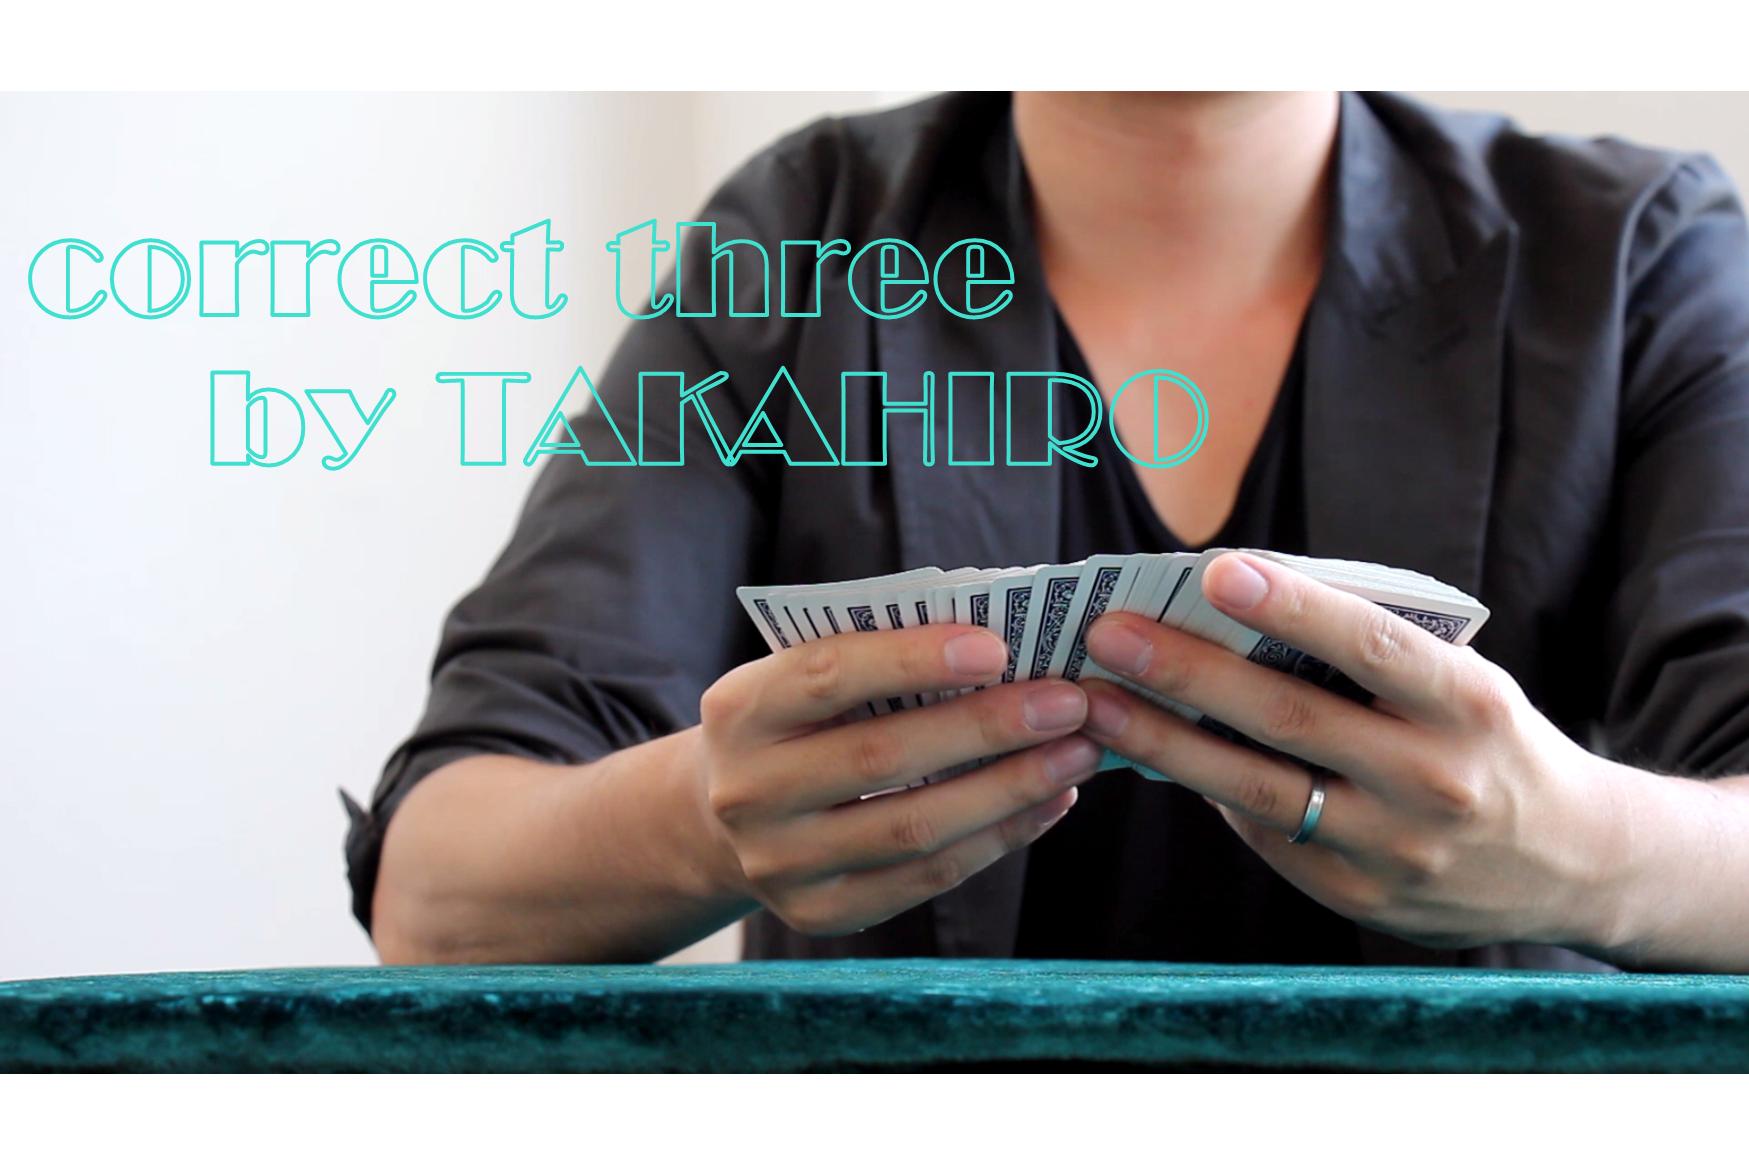 correct three  by TAKAHIRO